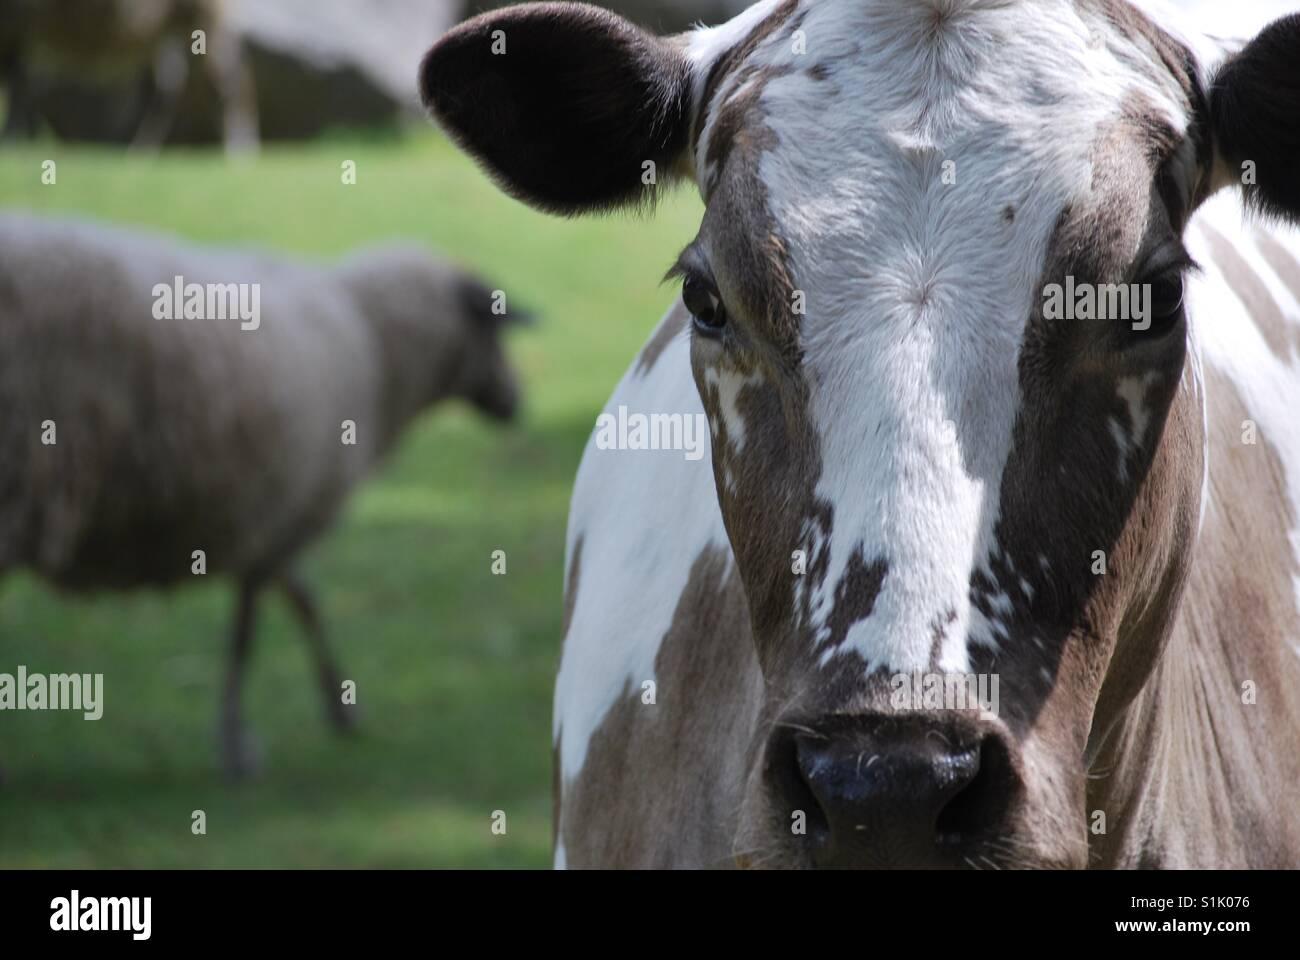 Farm animals on pasture - Stock Image